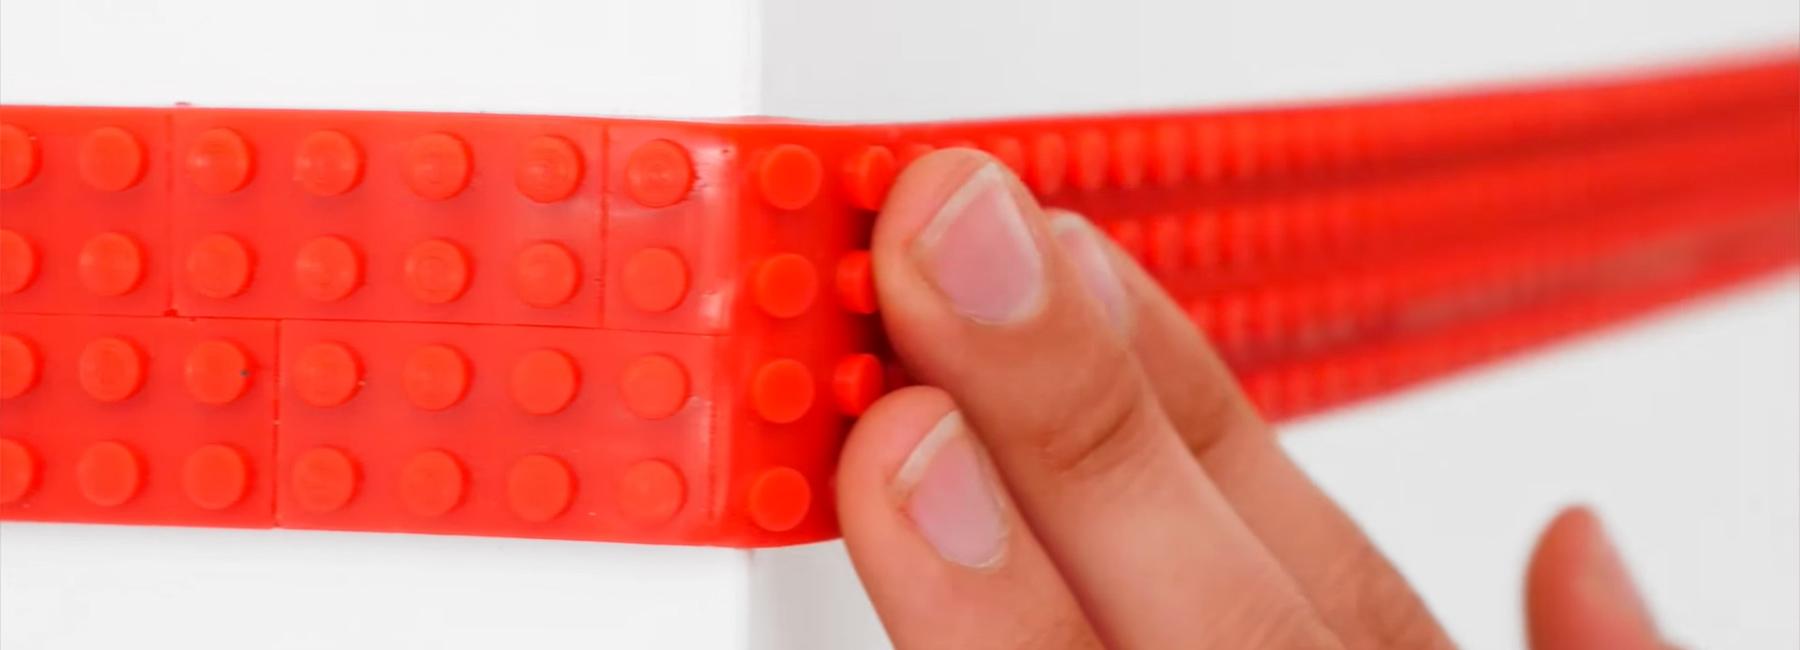 10_lego-tape02.jpg